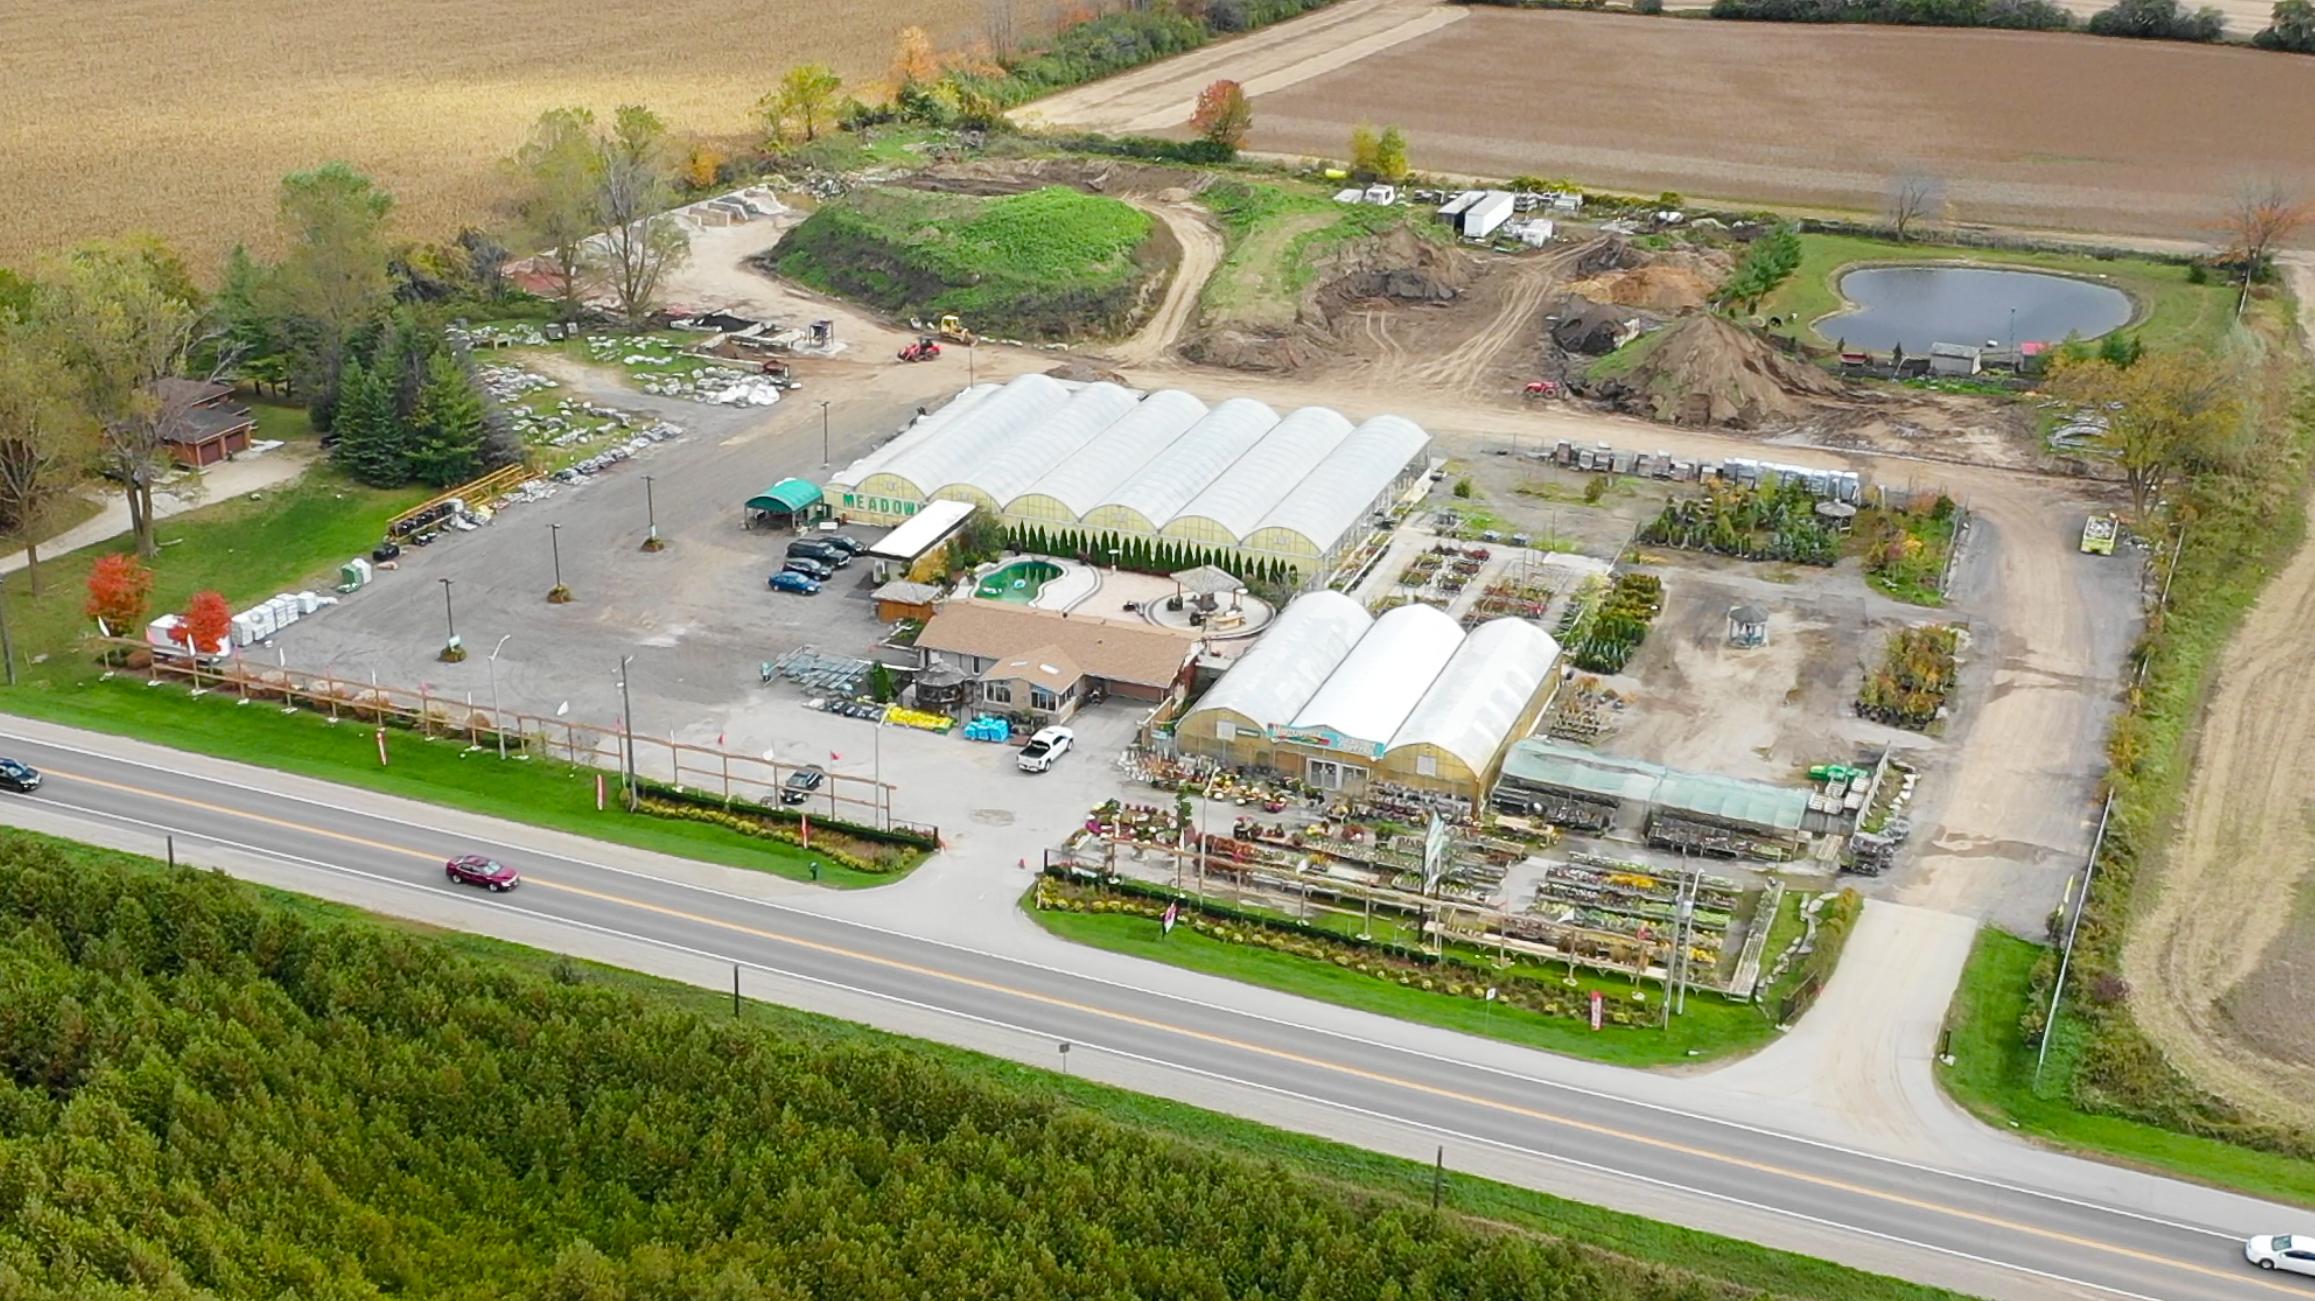 7767 Wellington Road 124, Guelph | Garden Centre – Land & Business for Sale